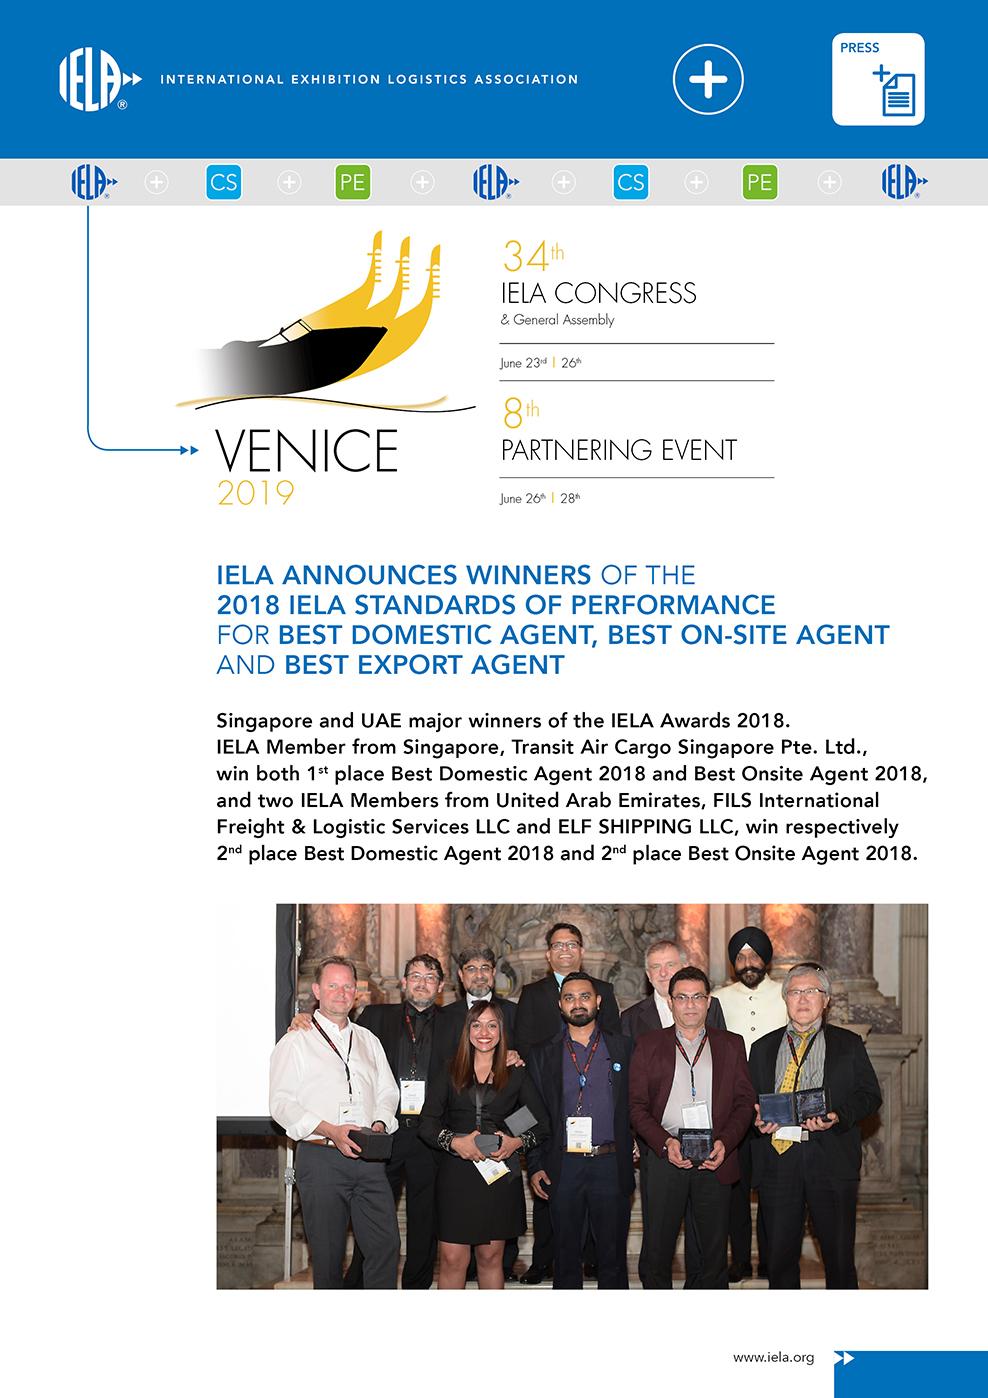 IELA Press Venice 2019